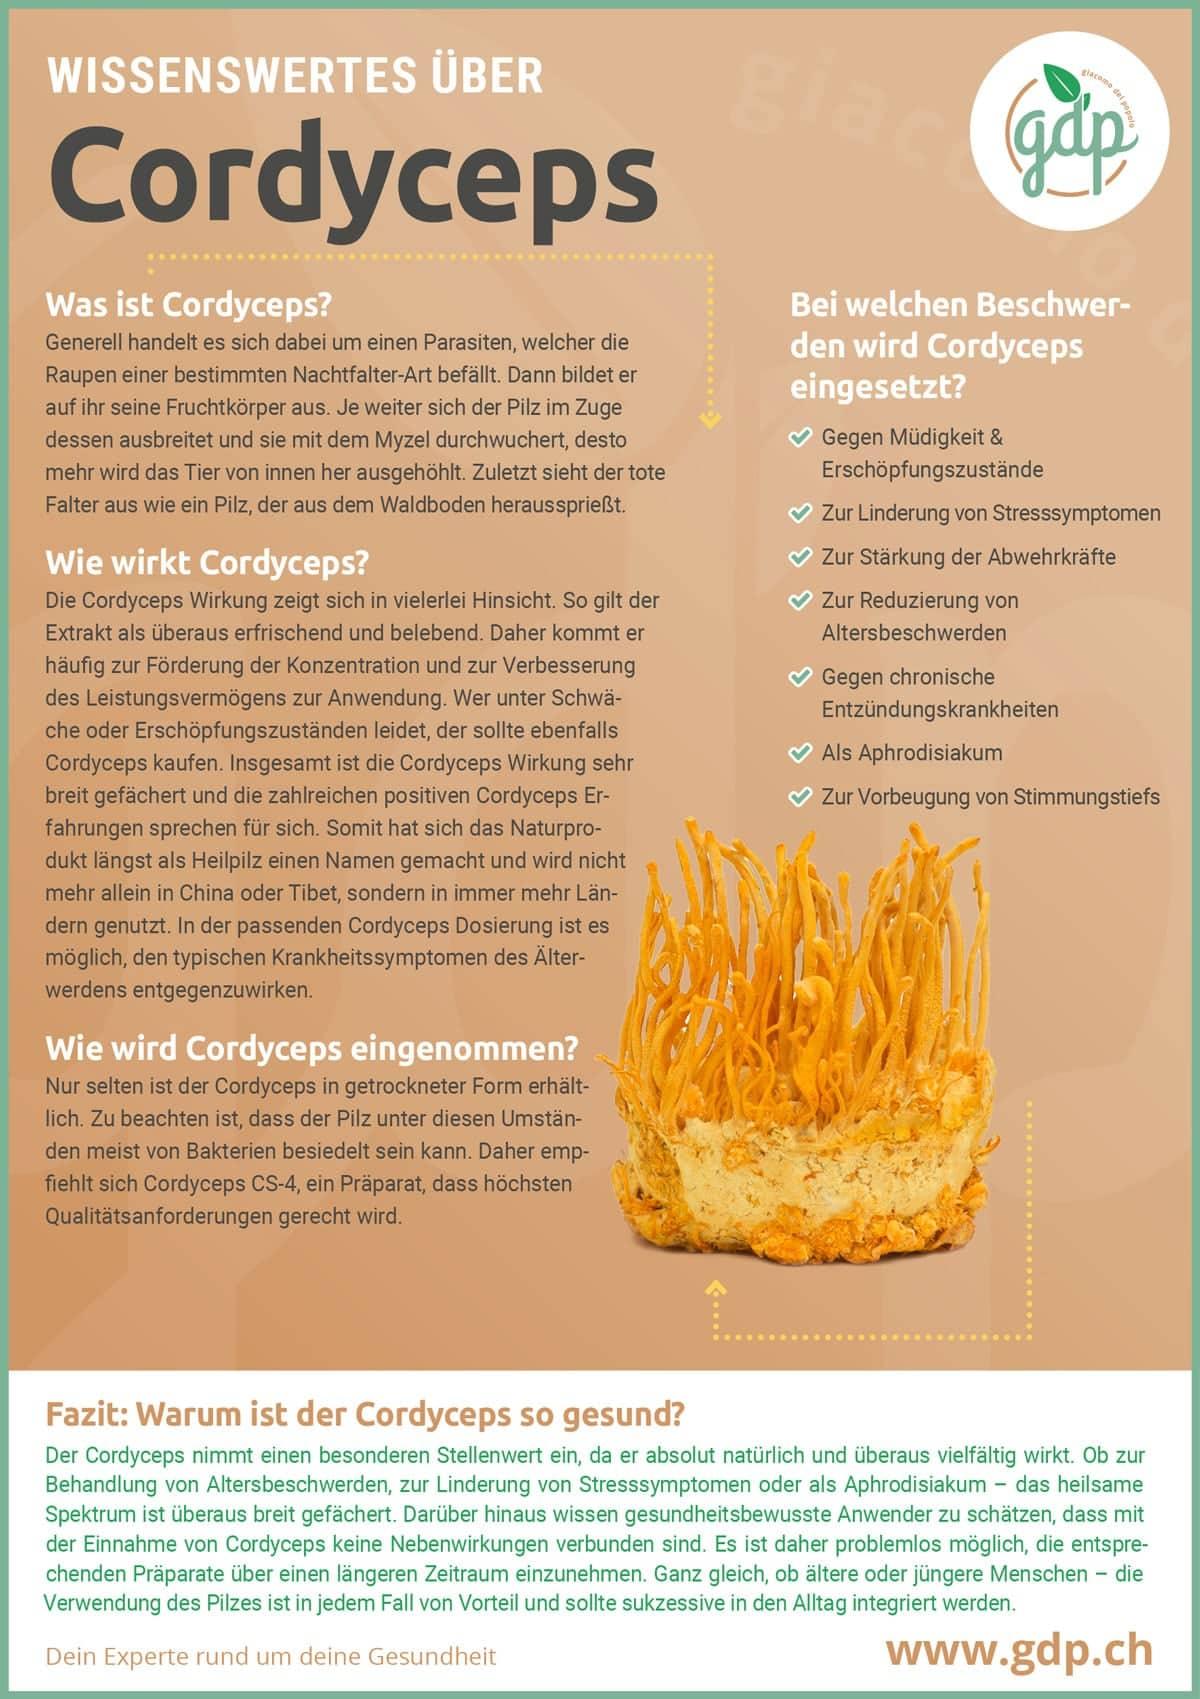 Cordyceps gdp Infografik